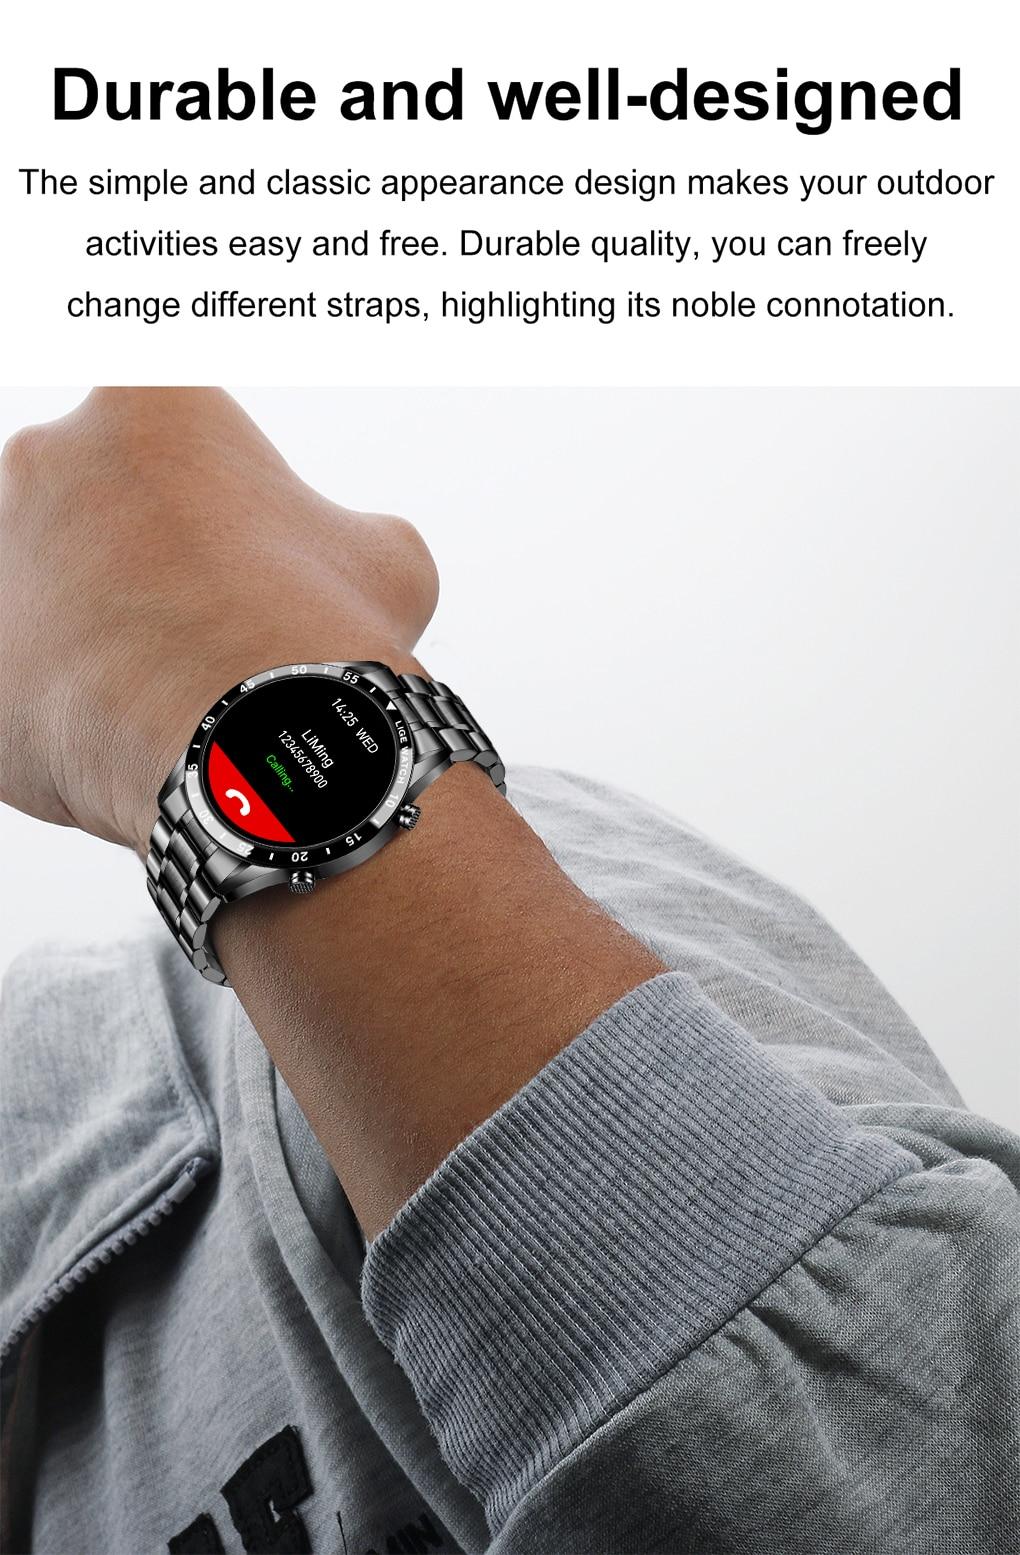 Hdca02b619ce042c89f47fe31501a802dQ LIGE 2021 Full circle touch screen steel Band luxury Bluetooth call Men smart watch Waterproof Sport Activity fitness watch+box